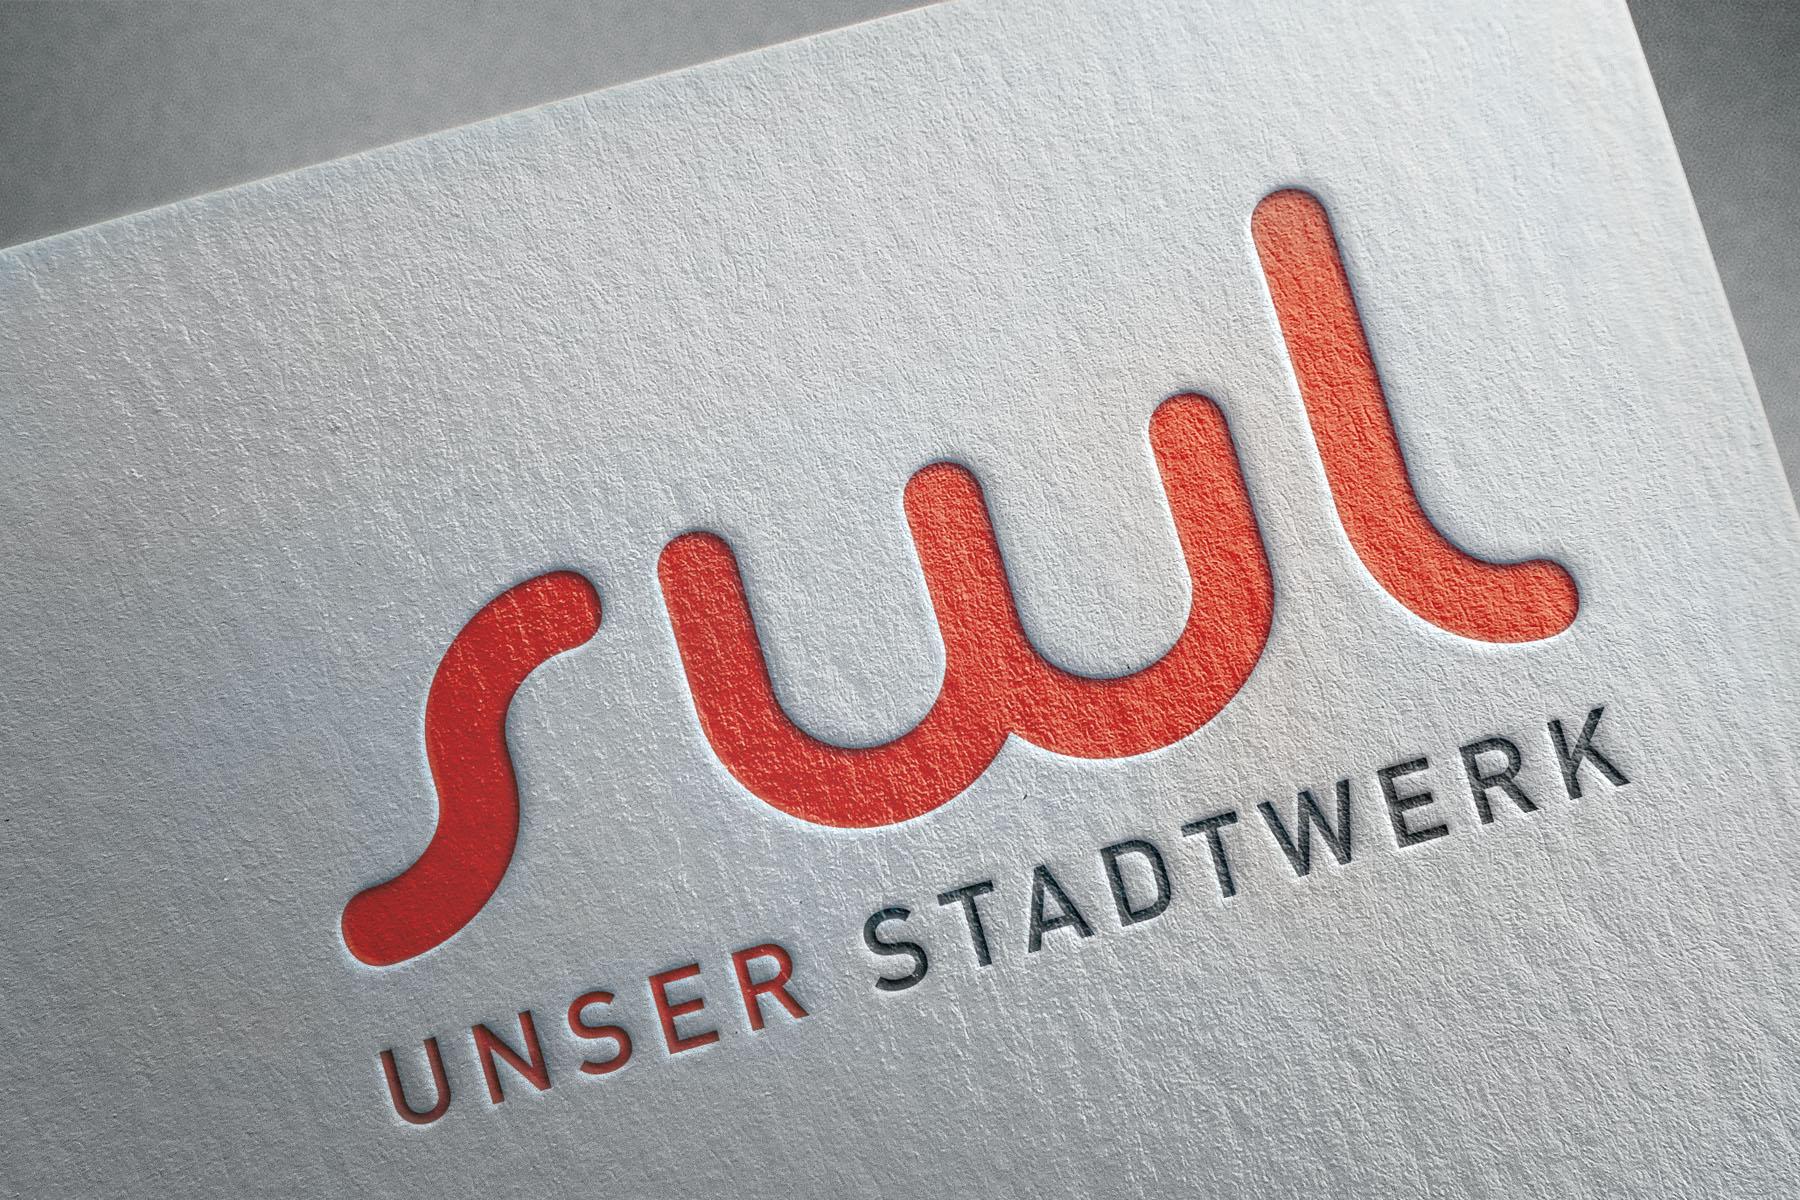 eh_referenzen_swl_1 Projekt - SWL